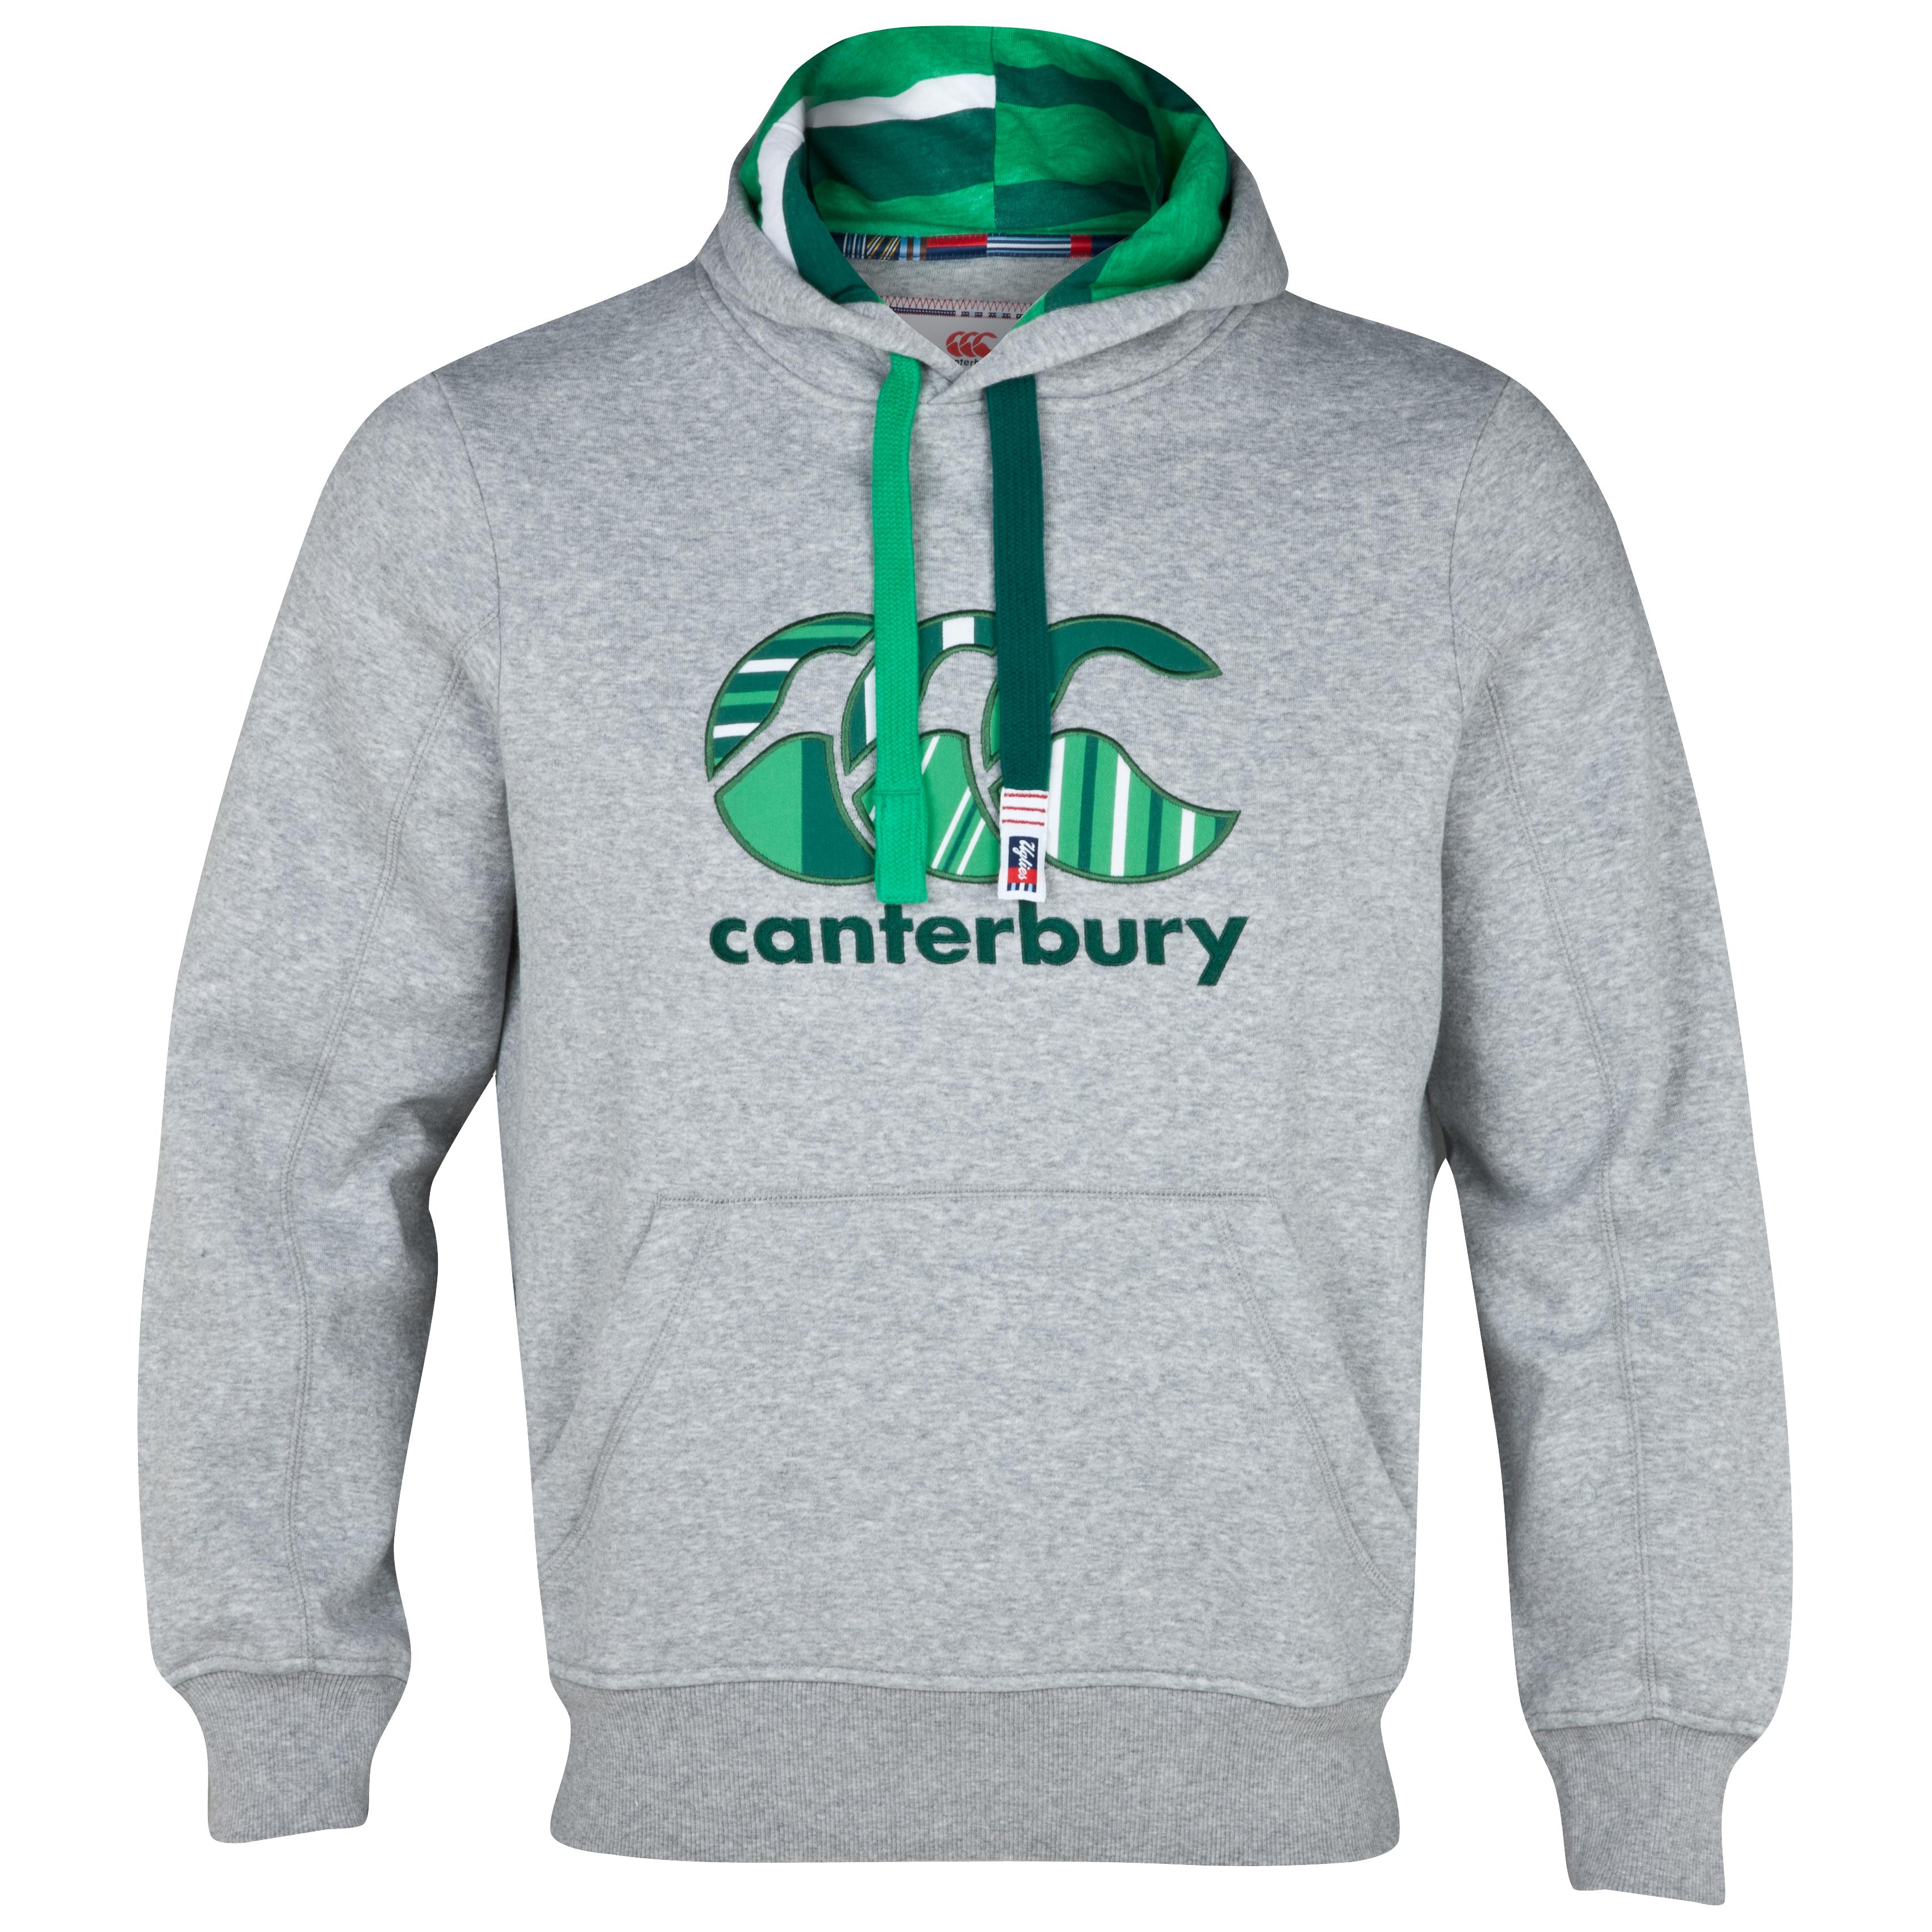 Canterbury Uglies OTH Hoody - Classic Marl